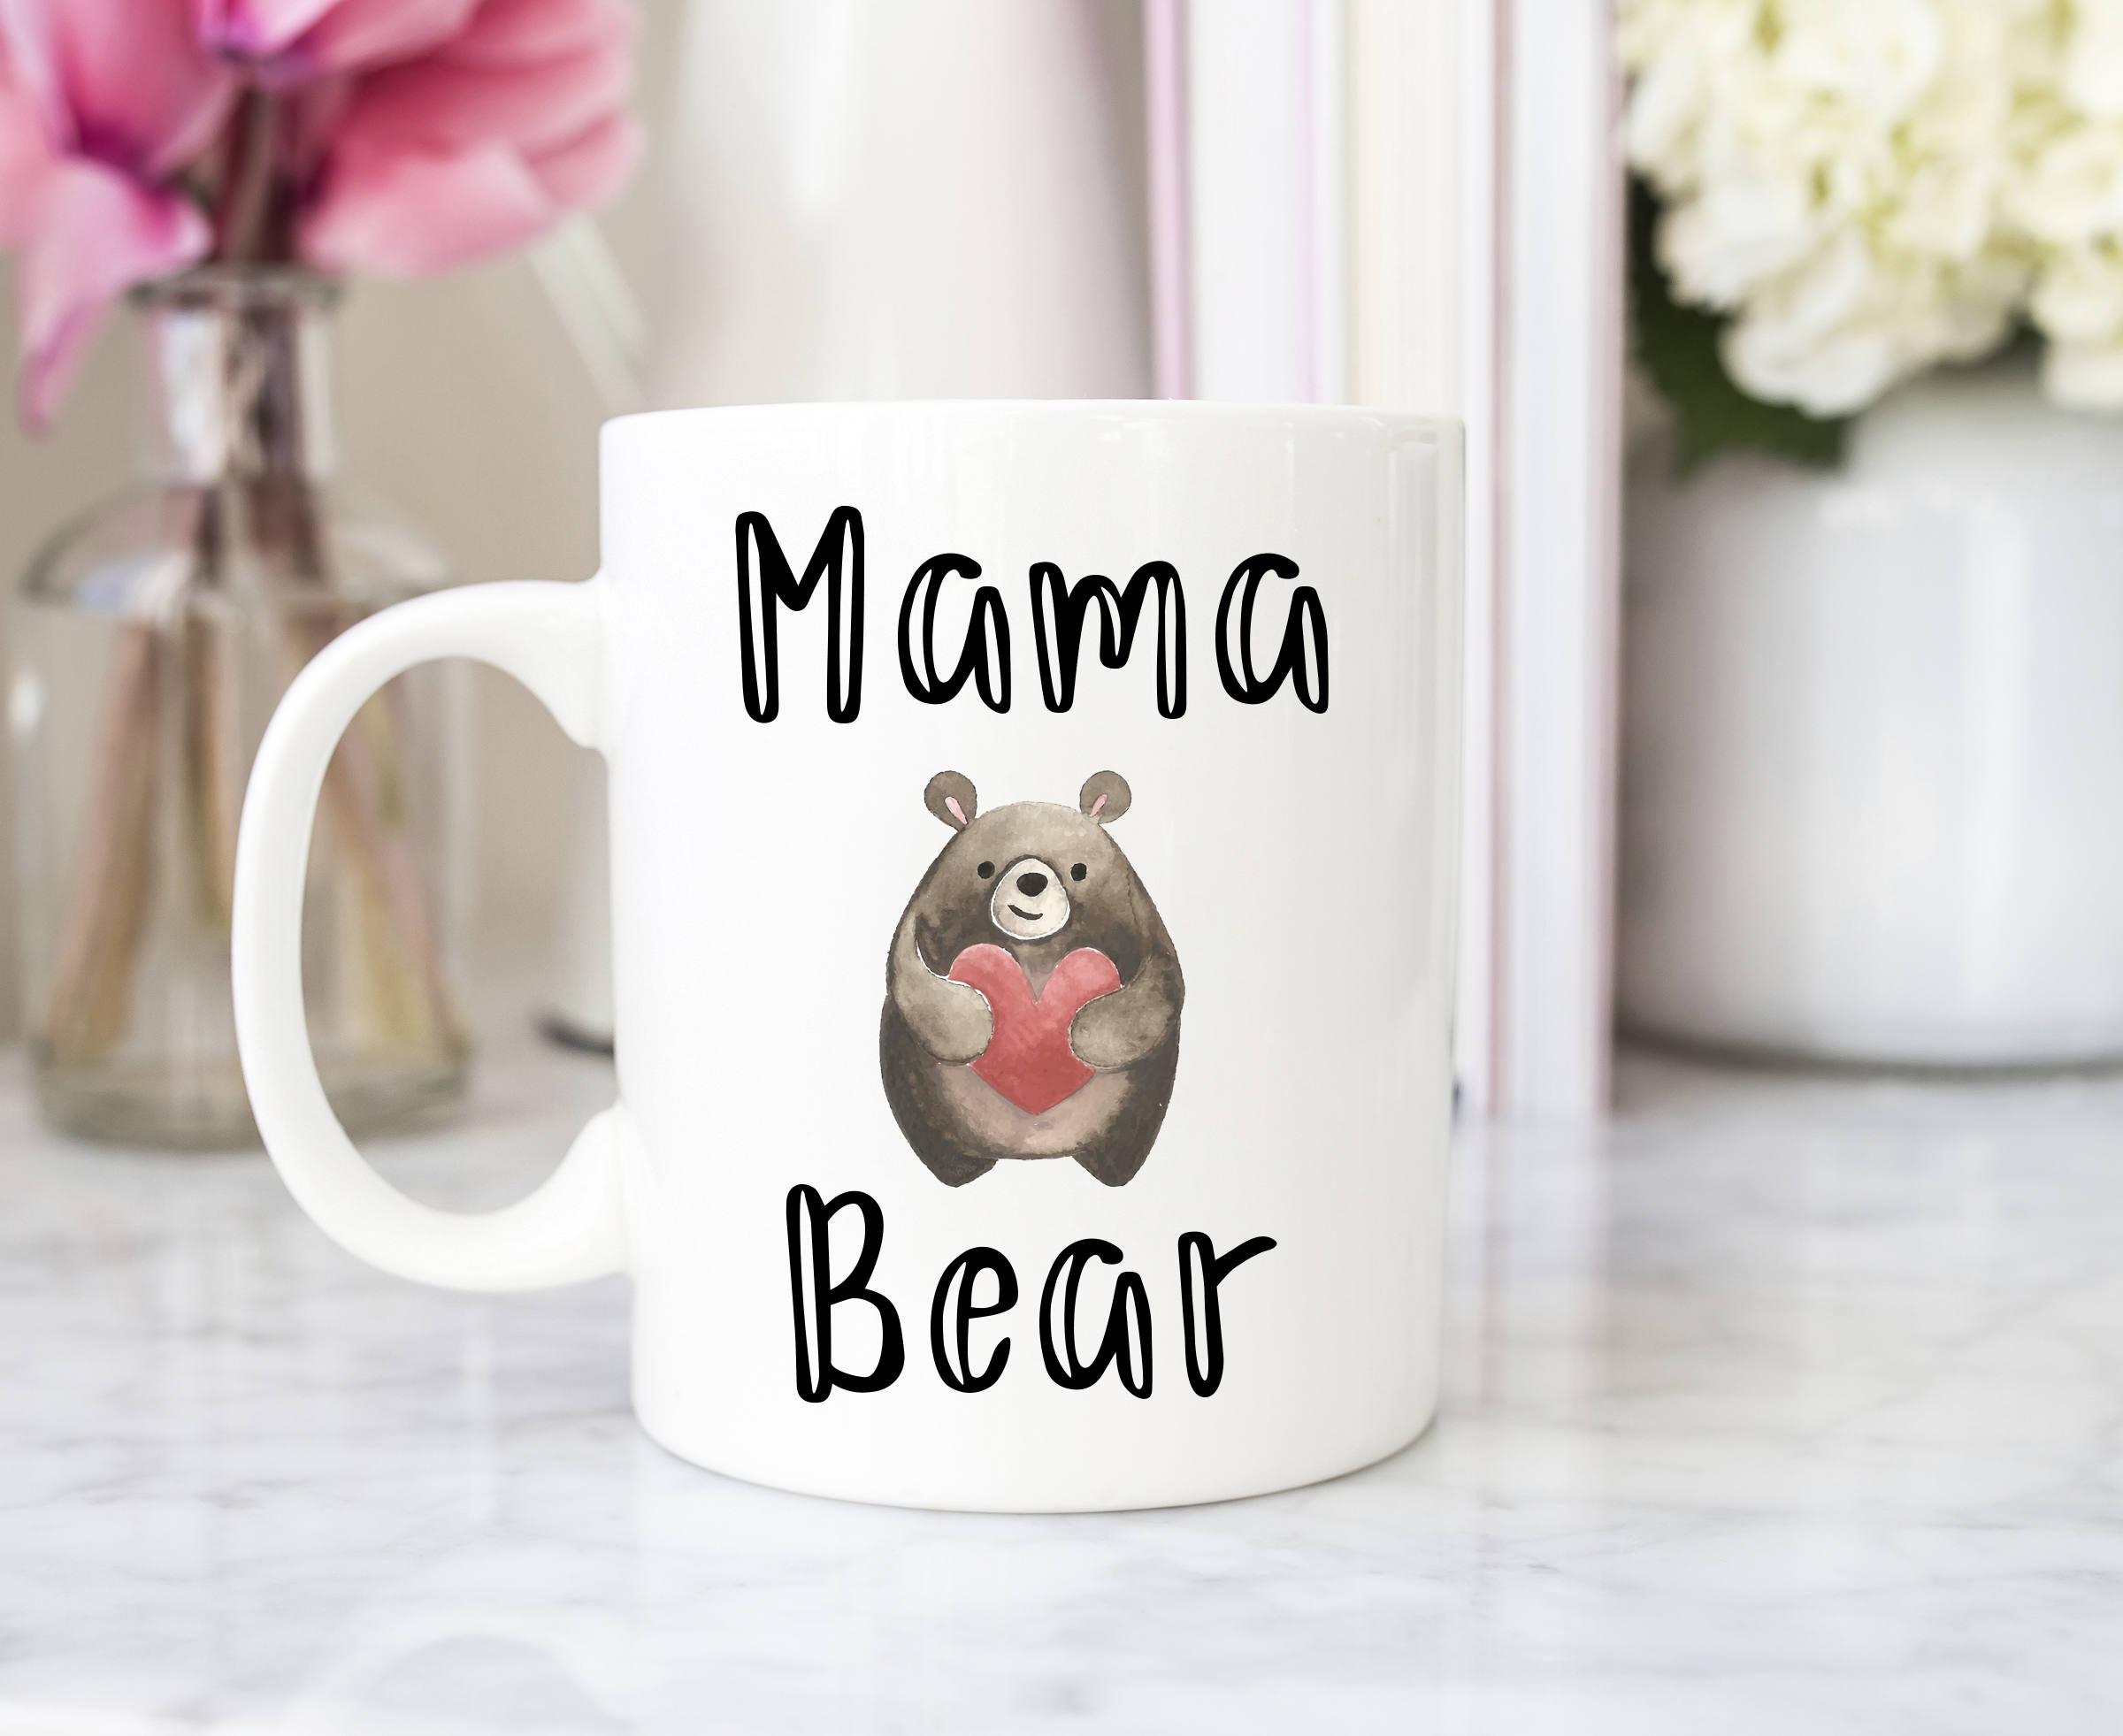 2020 Mama Bear Mug Mother's Day Gift Ceramic Creative Coffee Mug Lid Spoon,Best Mom Mug Mommy Mug Custom Mom Mug